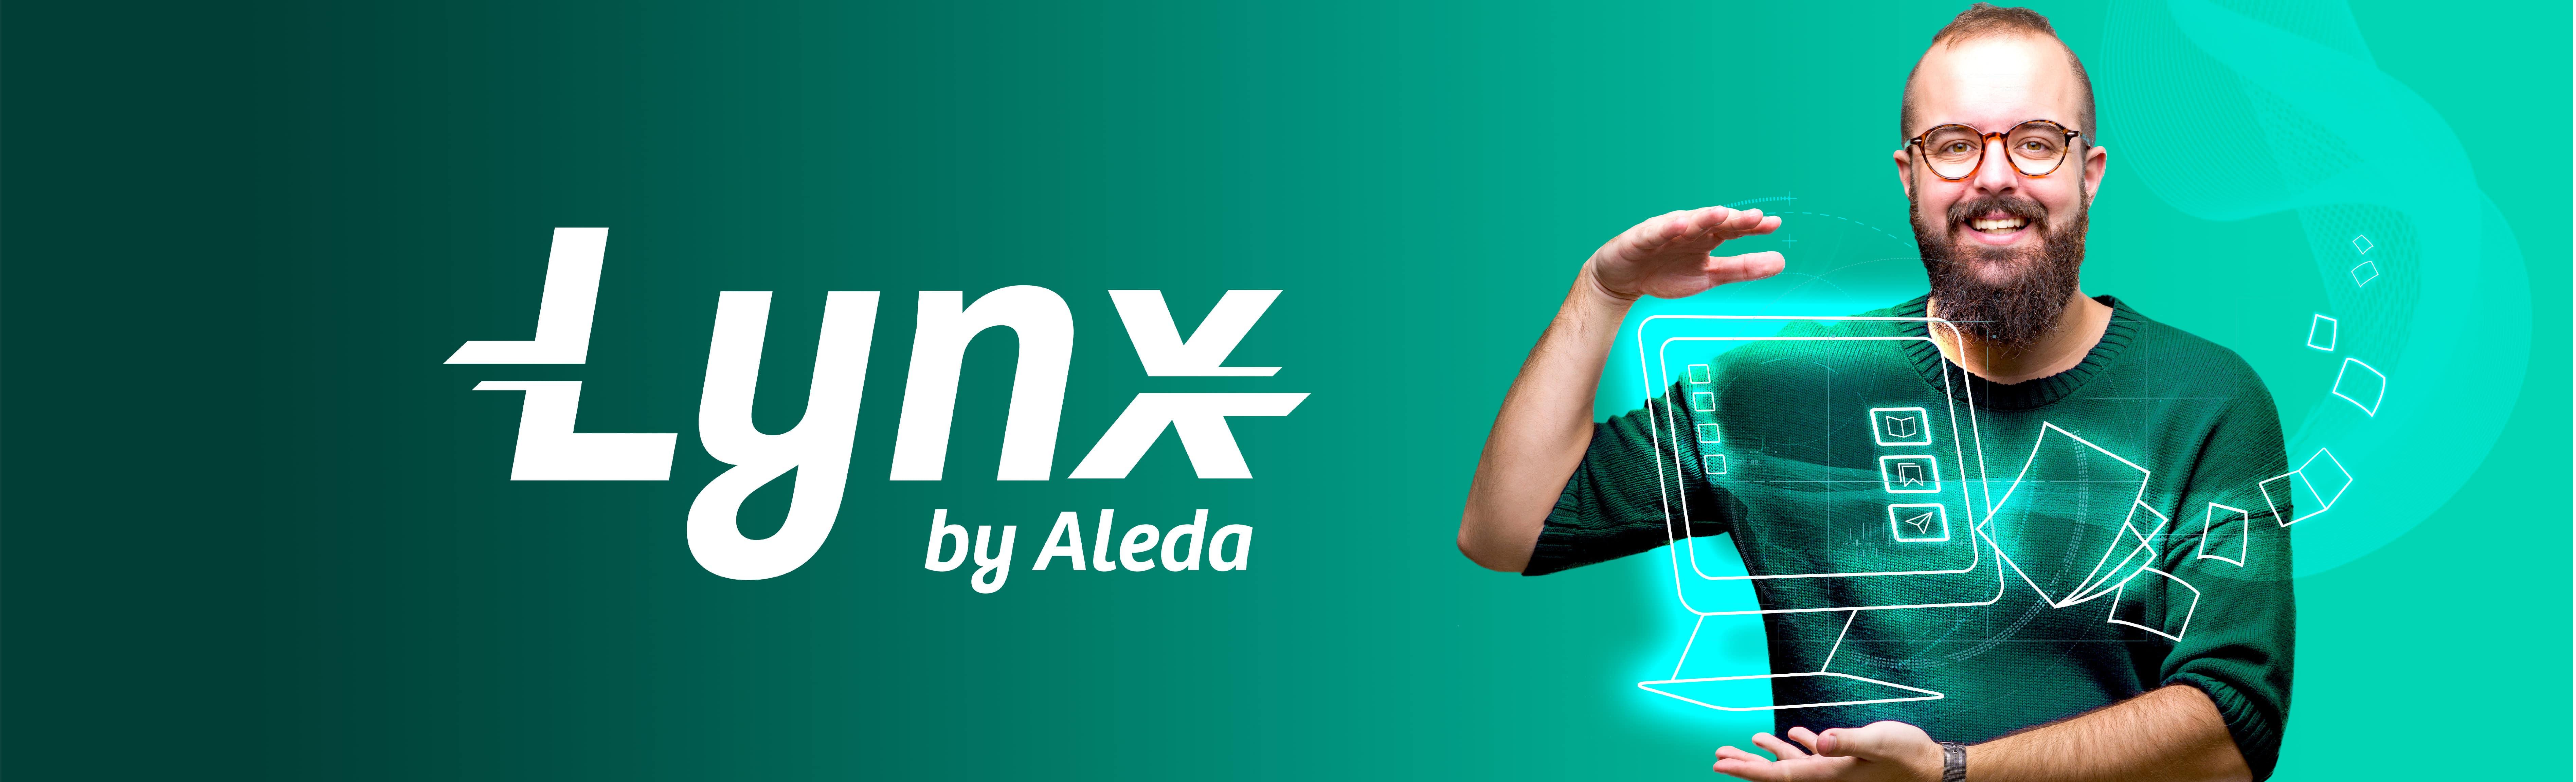 lynx-ambassadeur-identite-visuelle-logo-charte-graphique-univers-reference